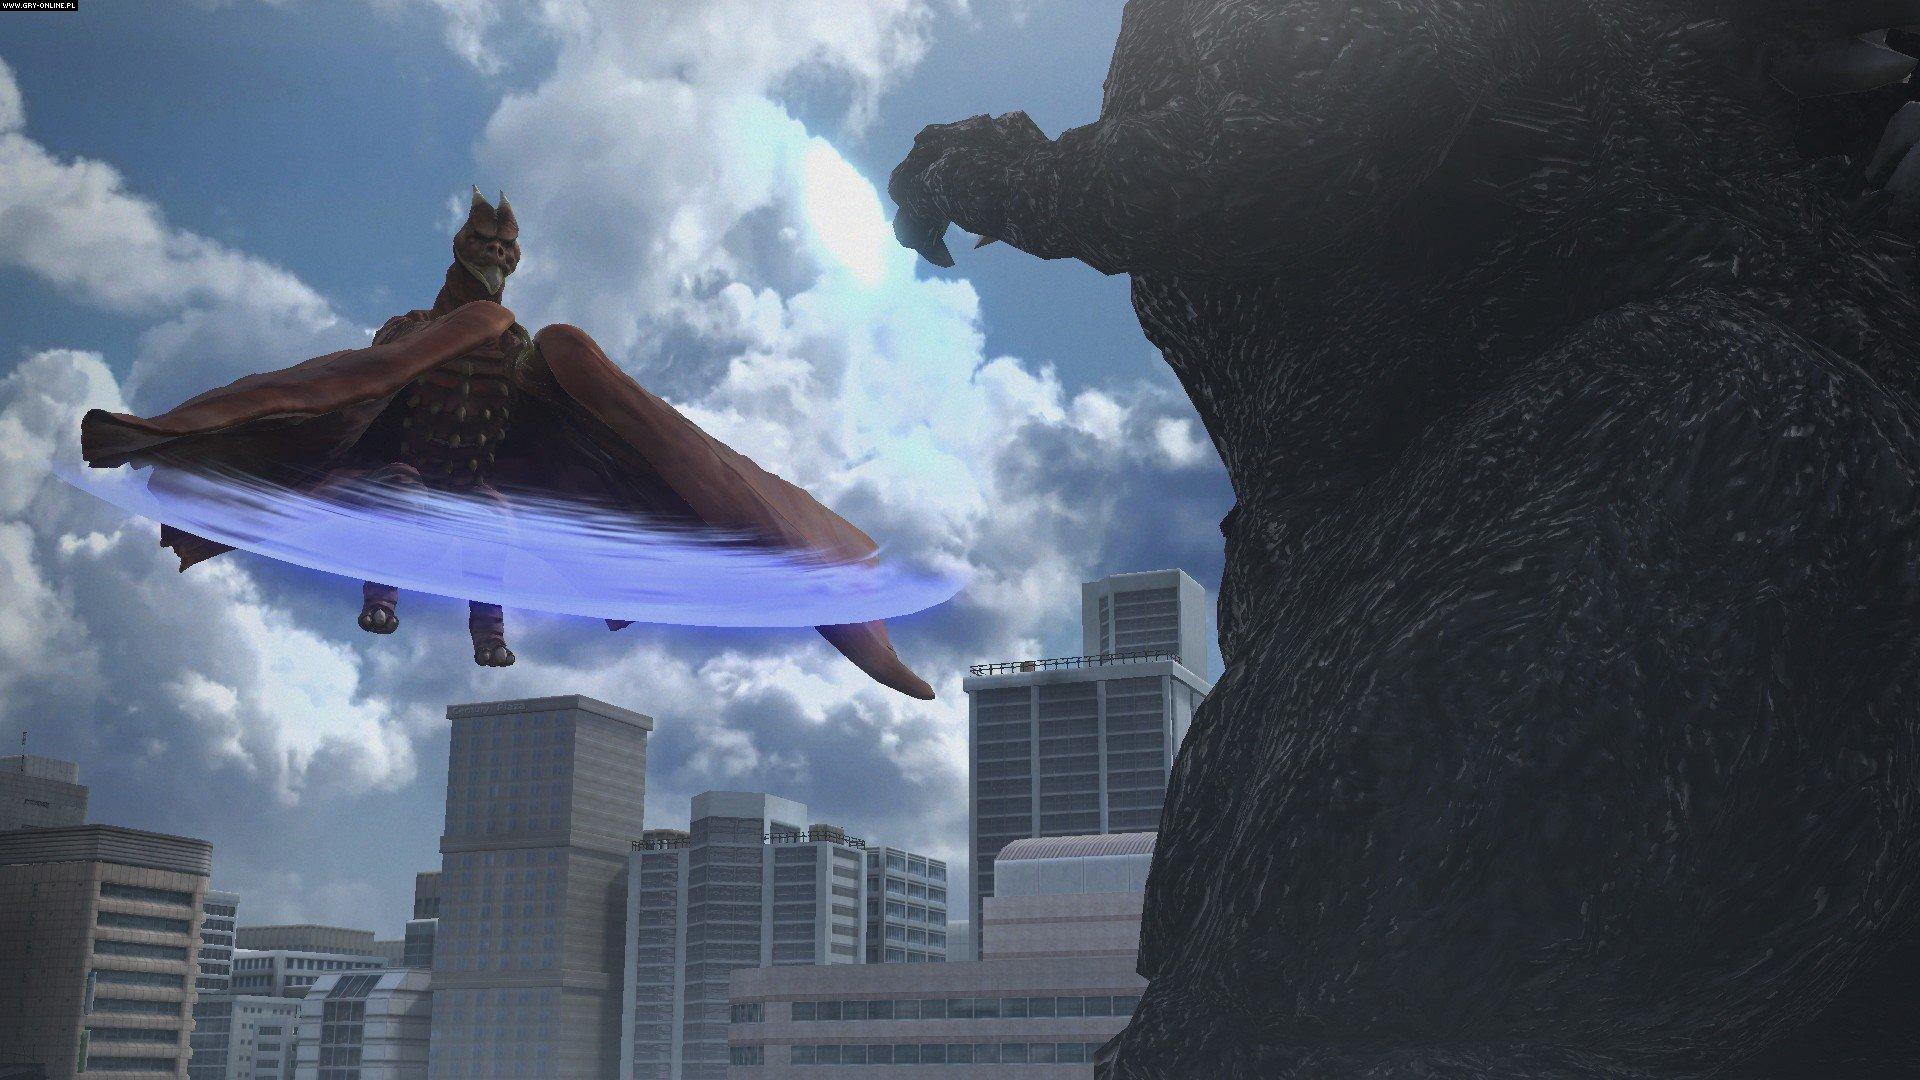 Ps4 Games Science Fiction : Godzilla screenshots gallery screenshot